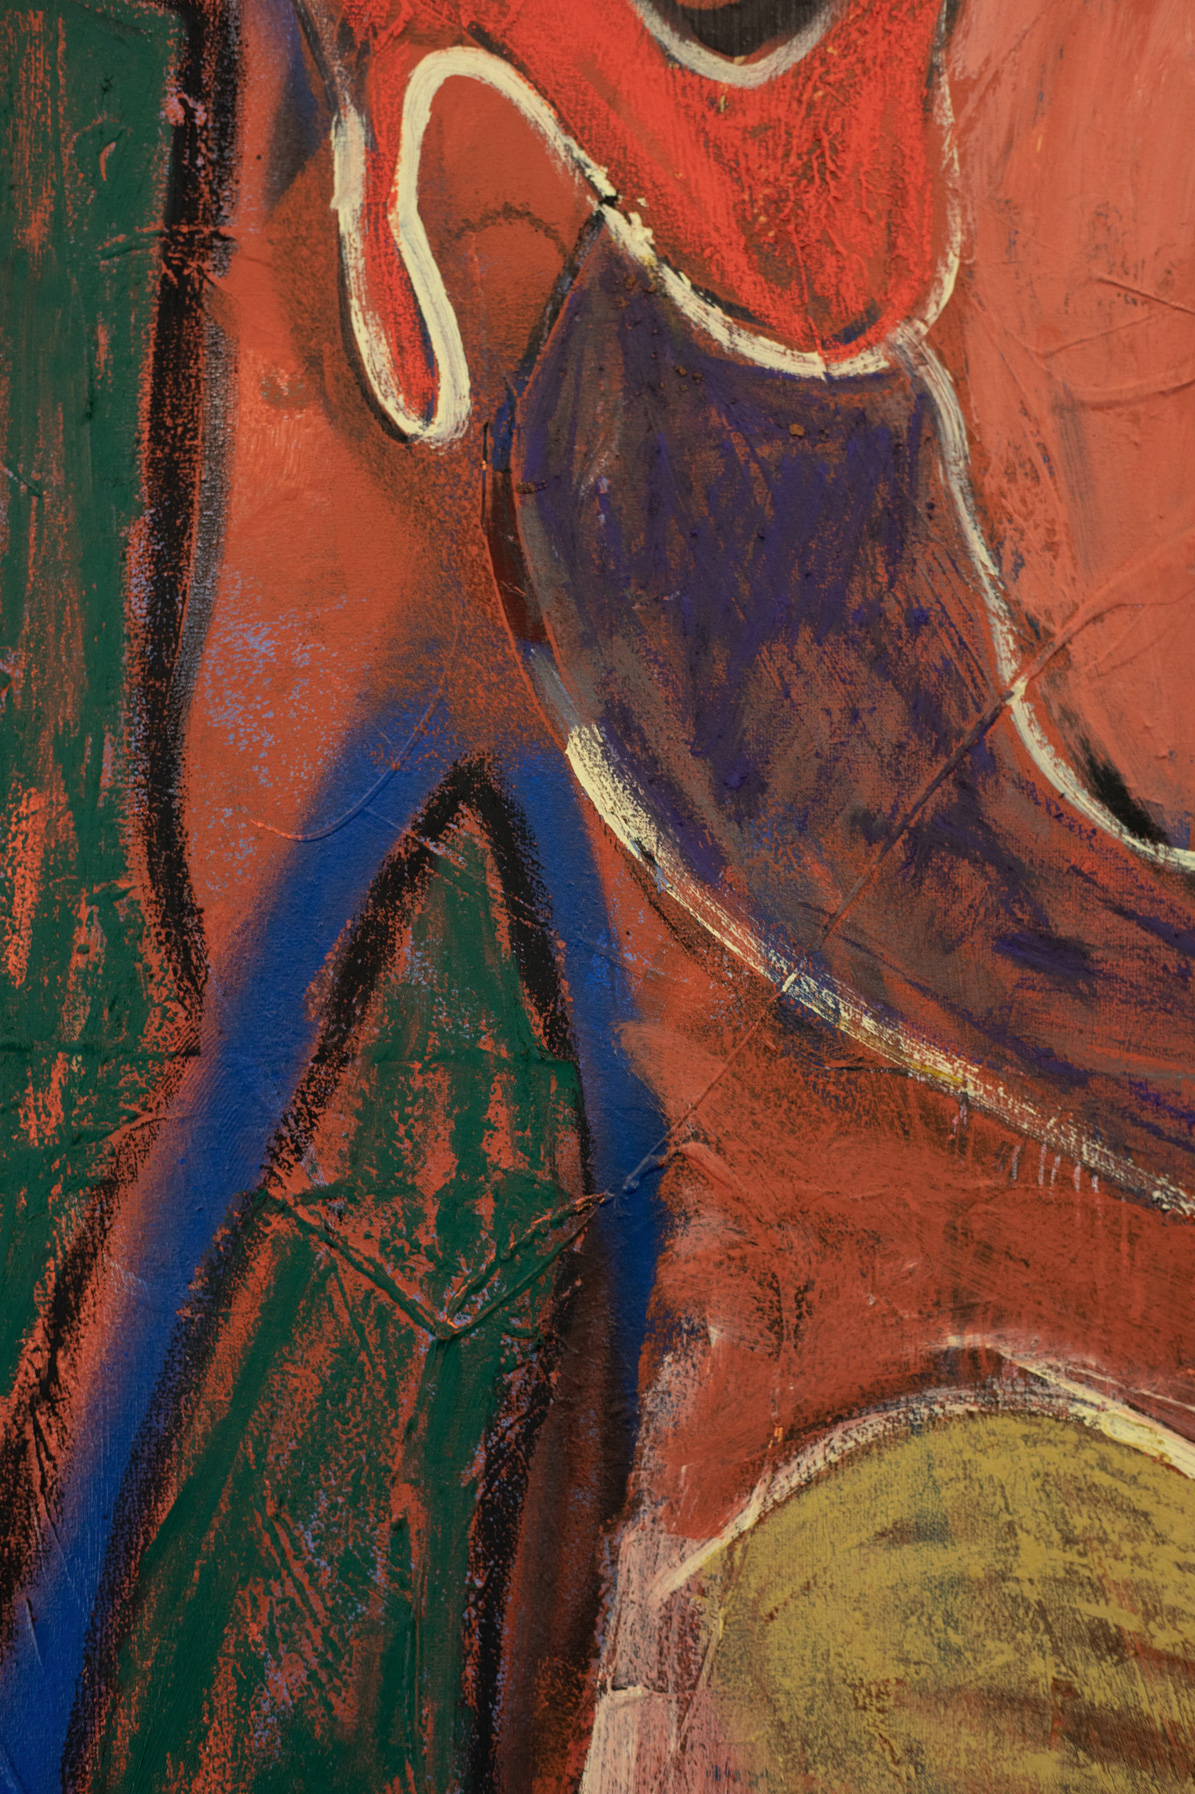 james watkins melania toma painters abstract london0012